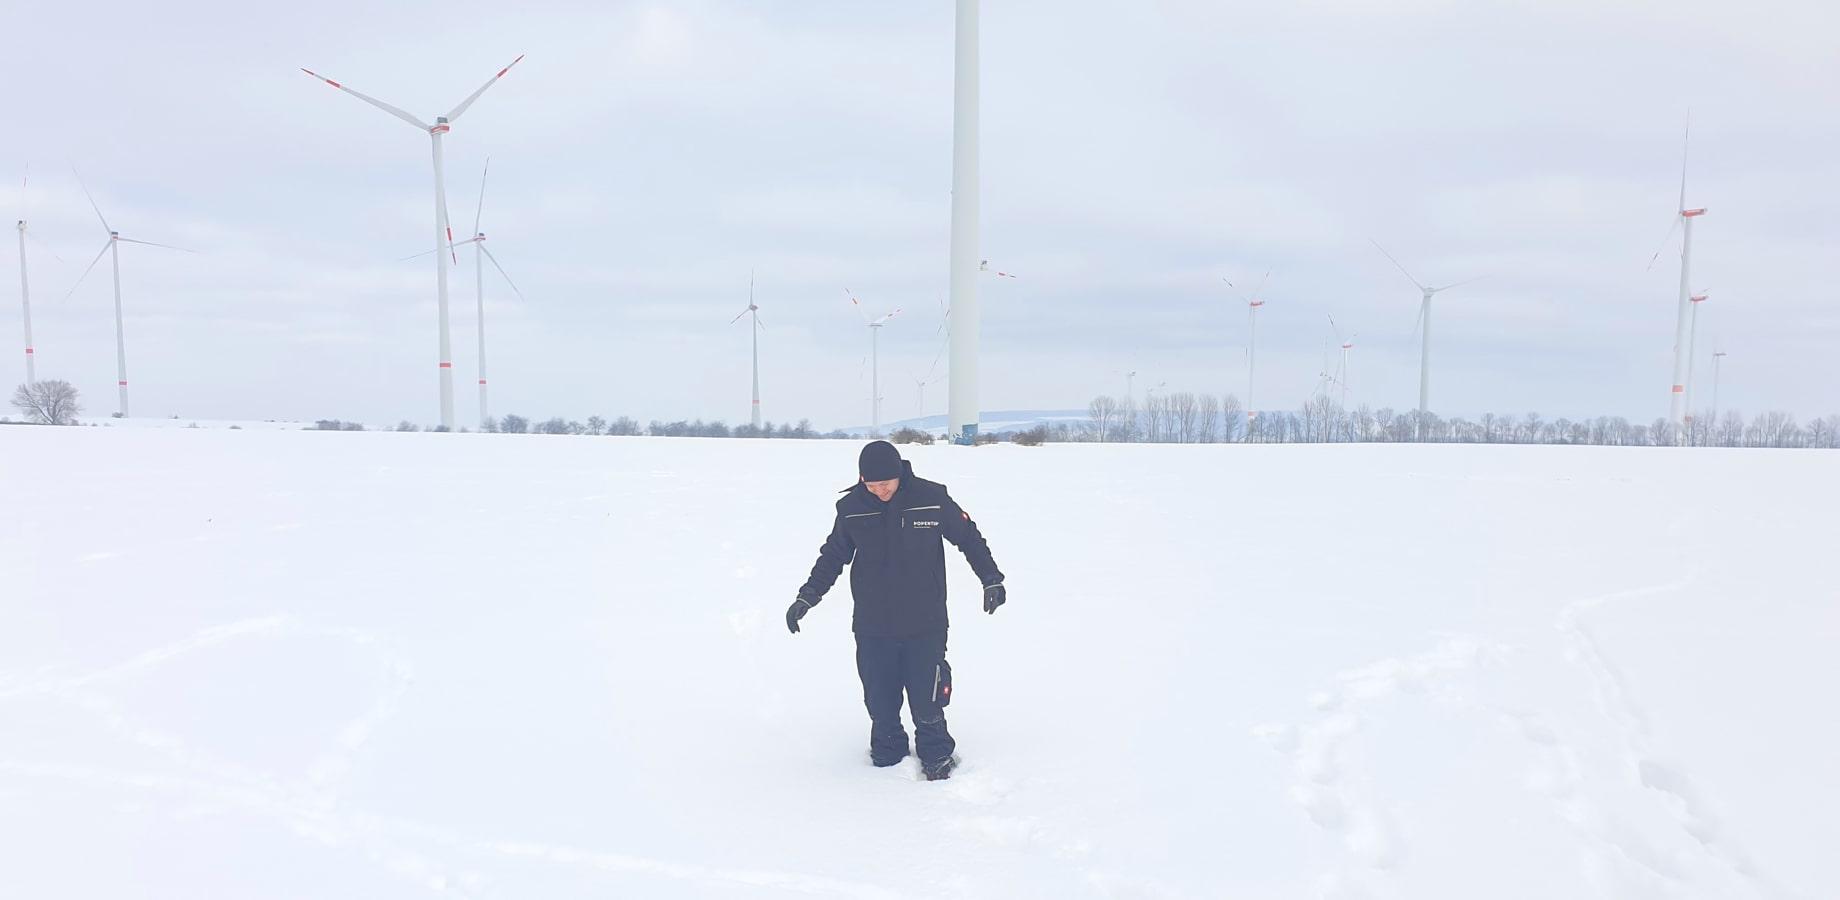 Momentum-snow-drifting-wind-power-min